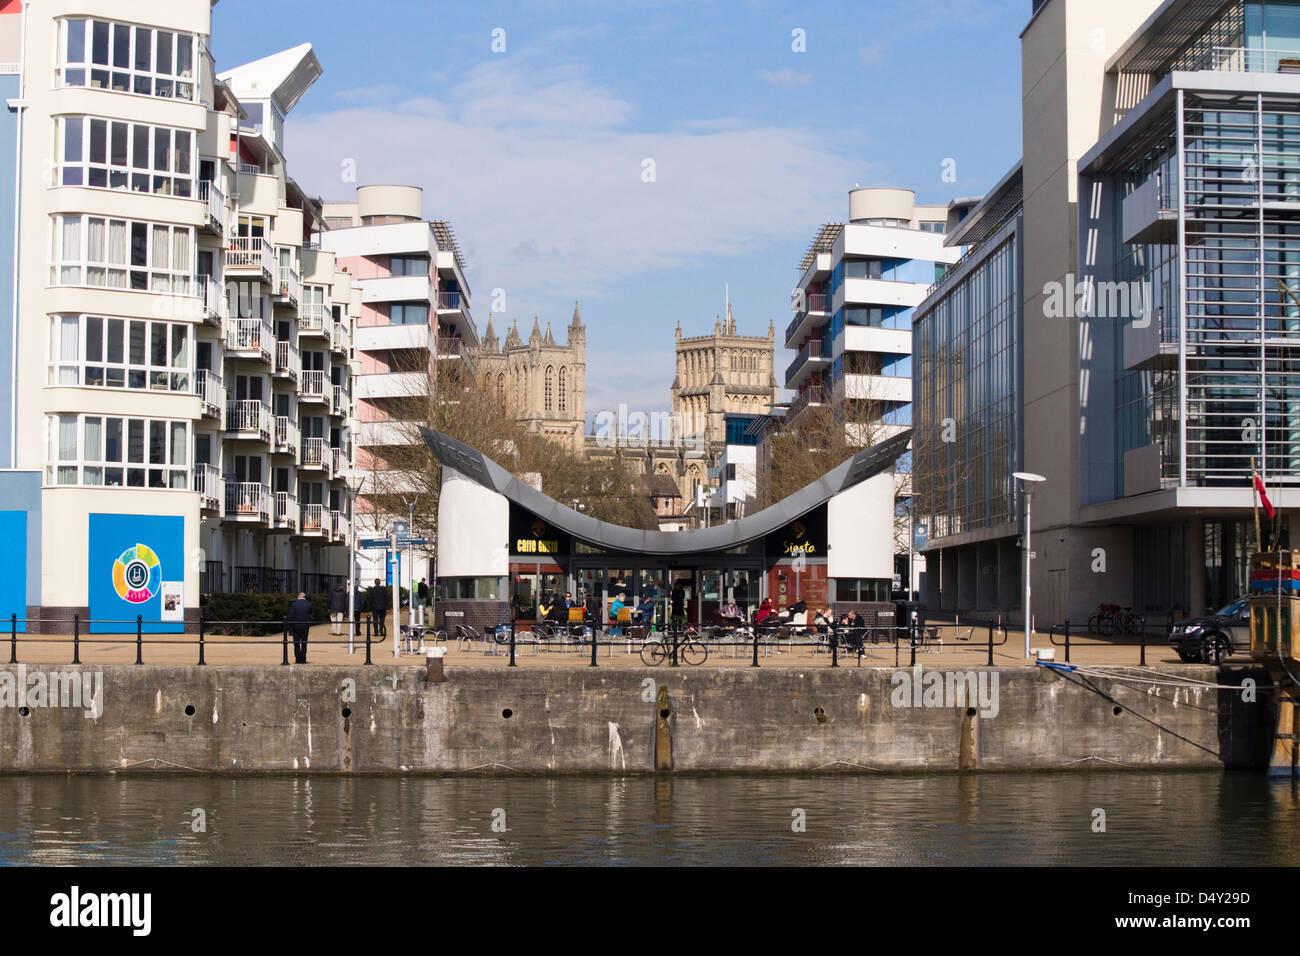 Cafe Gusto, Bristol Hafen Bristol England UK Stockbild